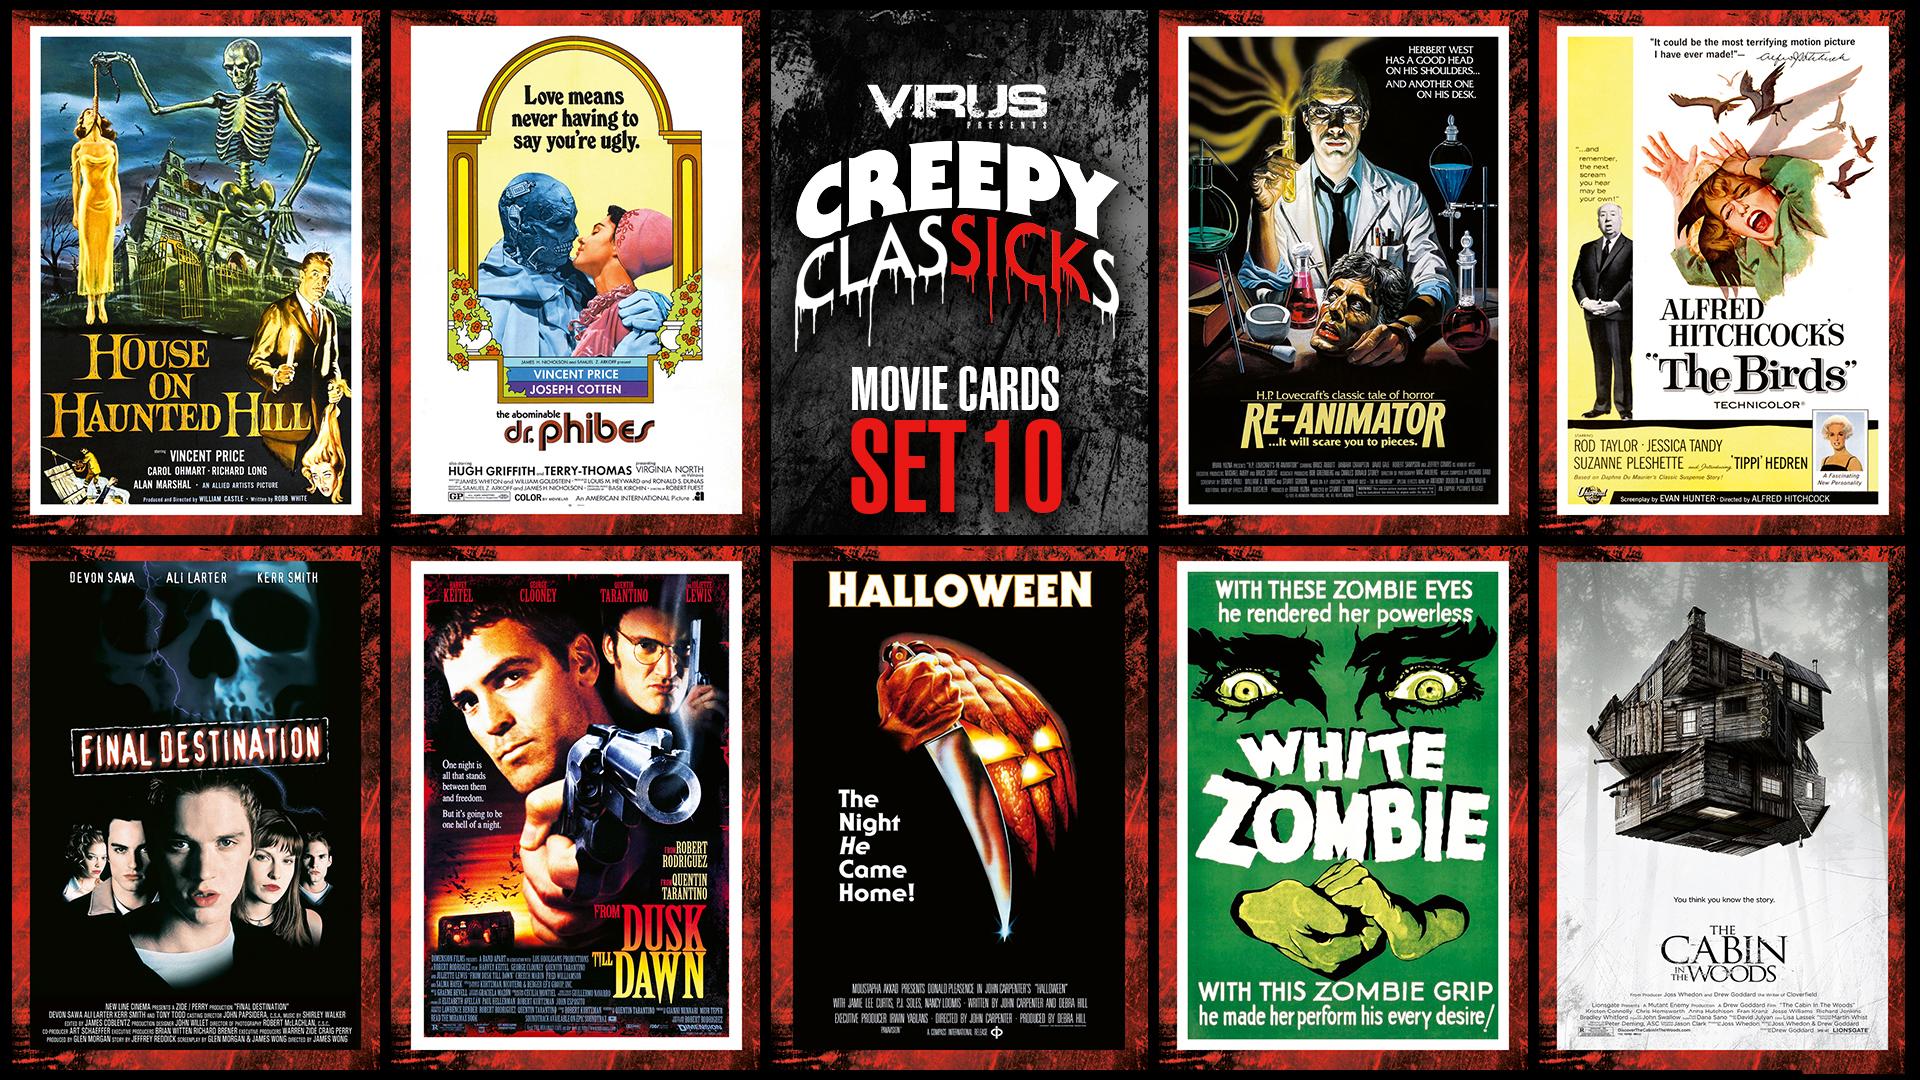 VIRUS Creepy ClasSICKs Movie Cards Set #10